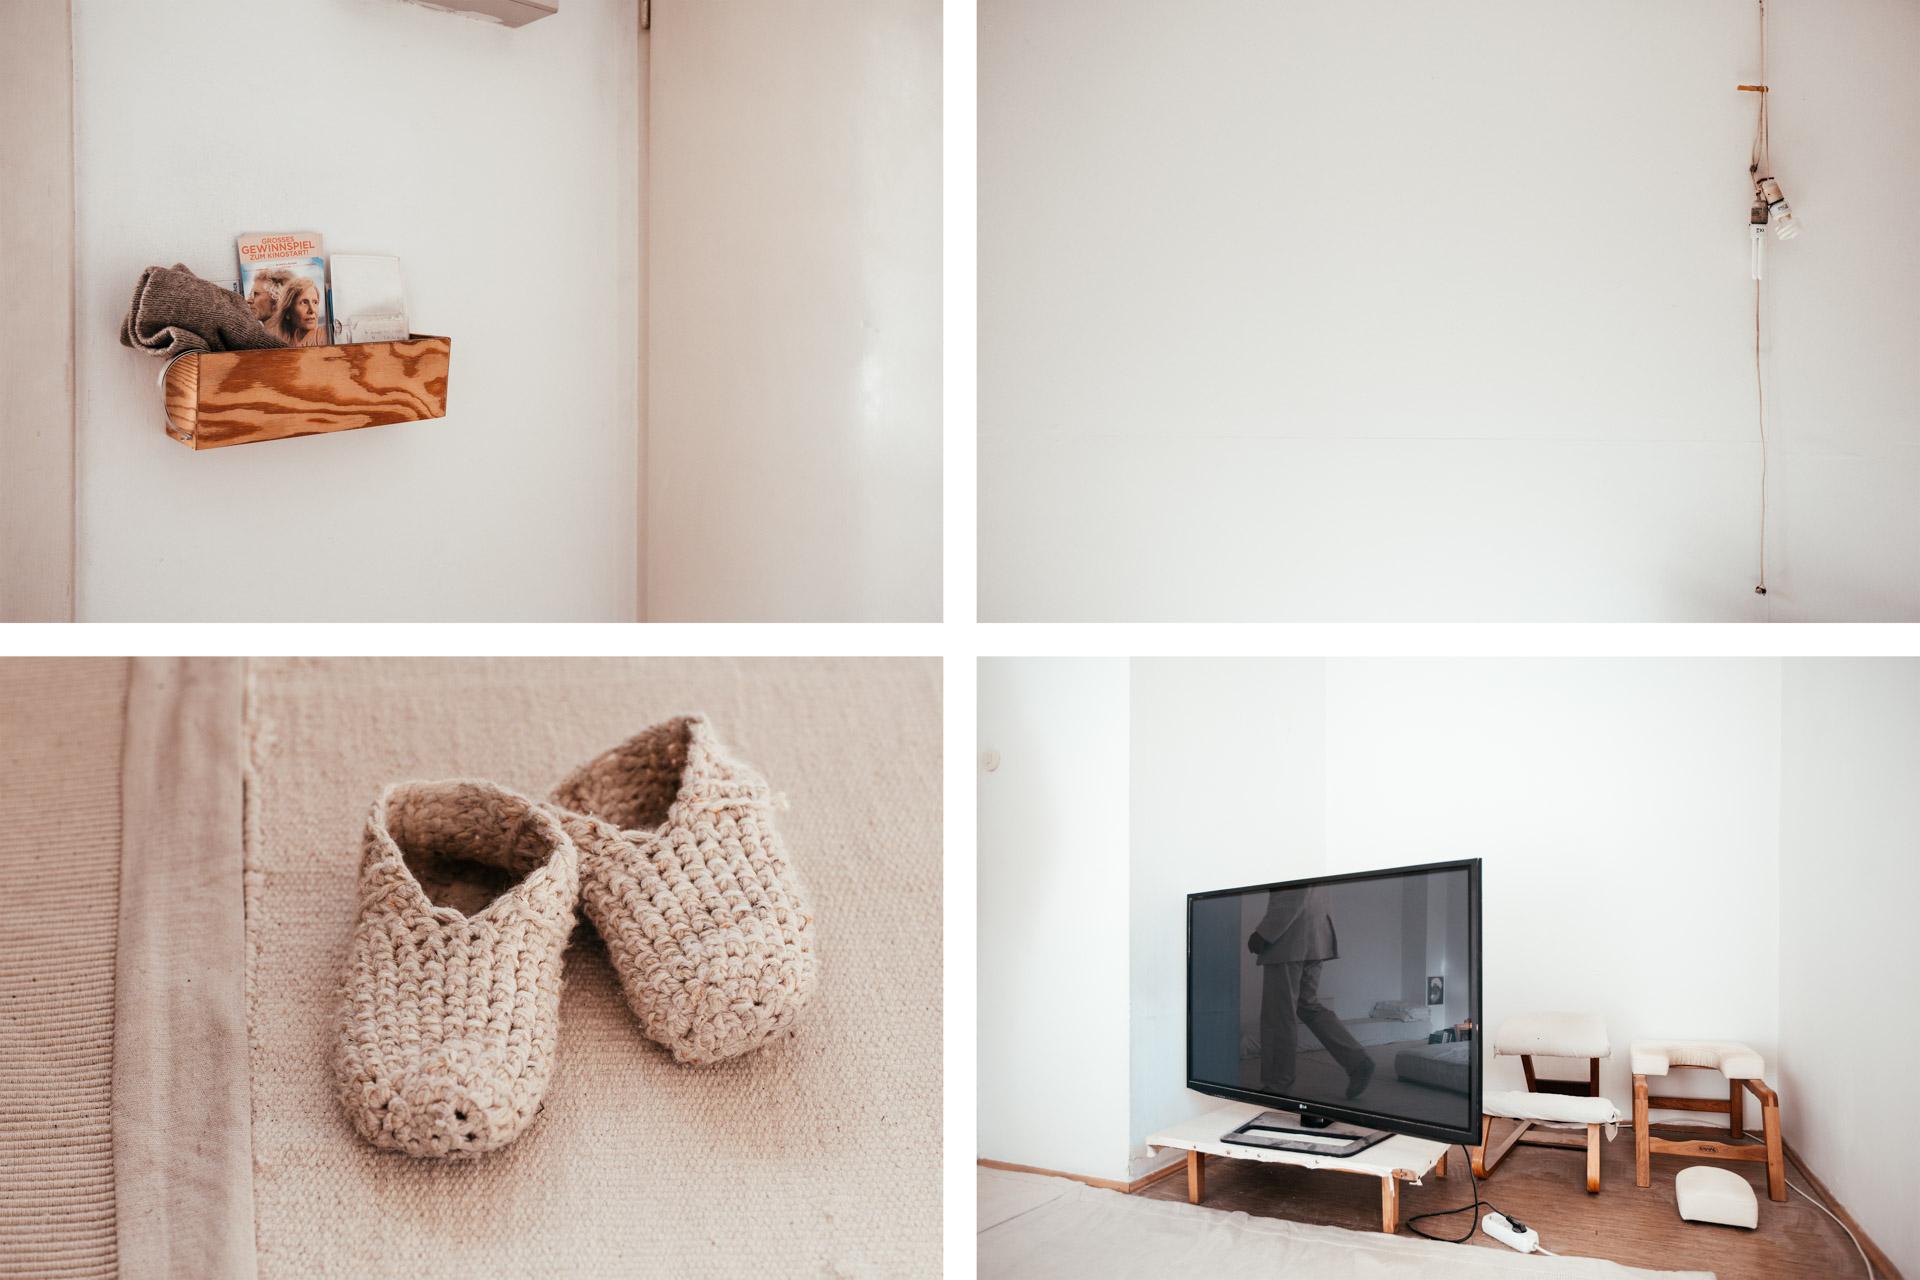 Rainer Langhans Minimalismus